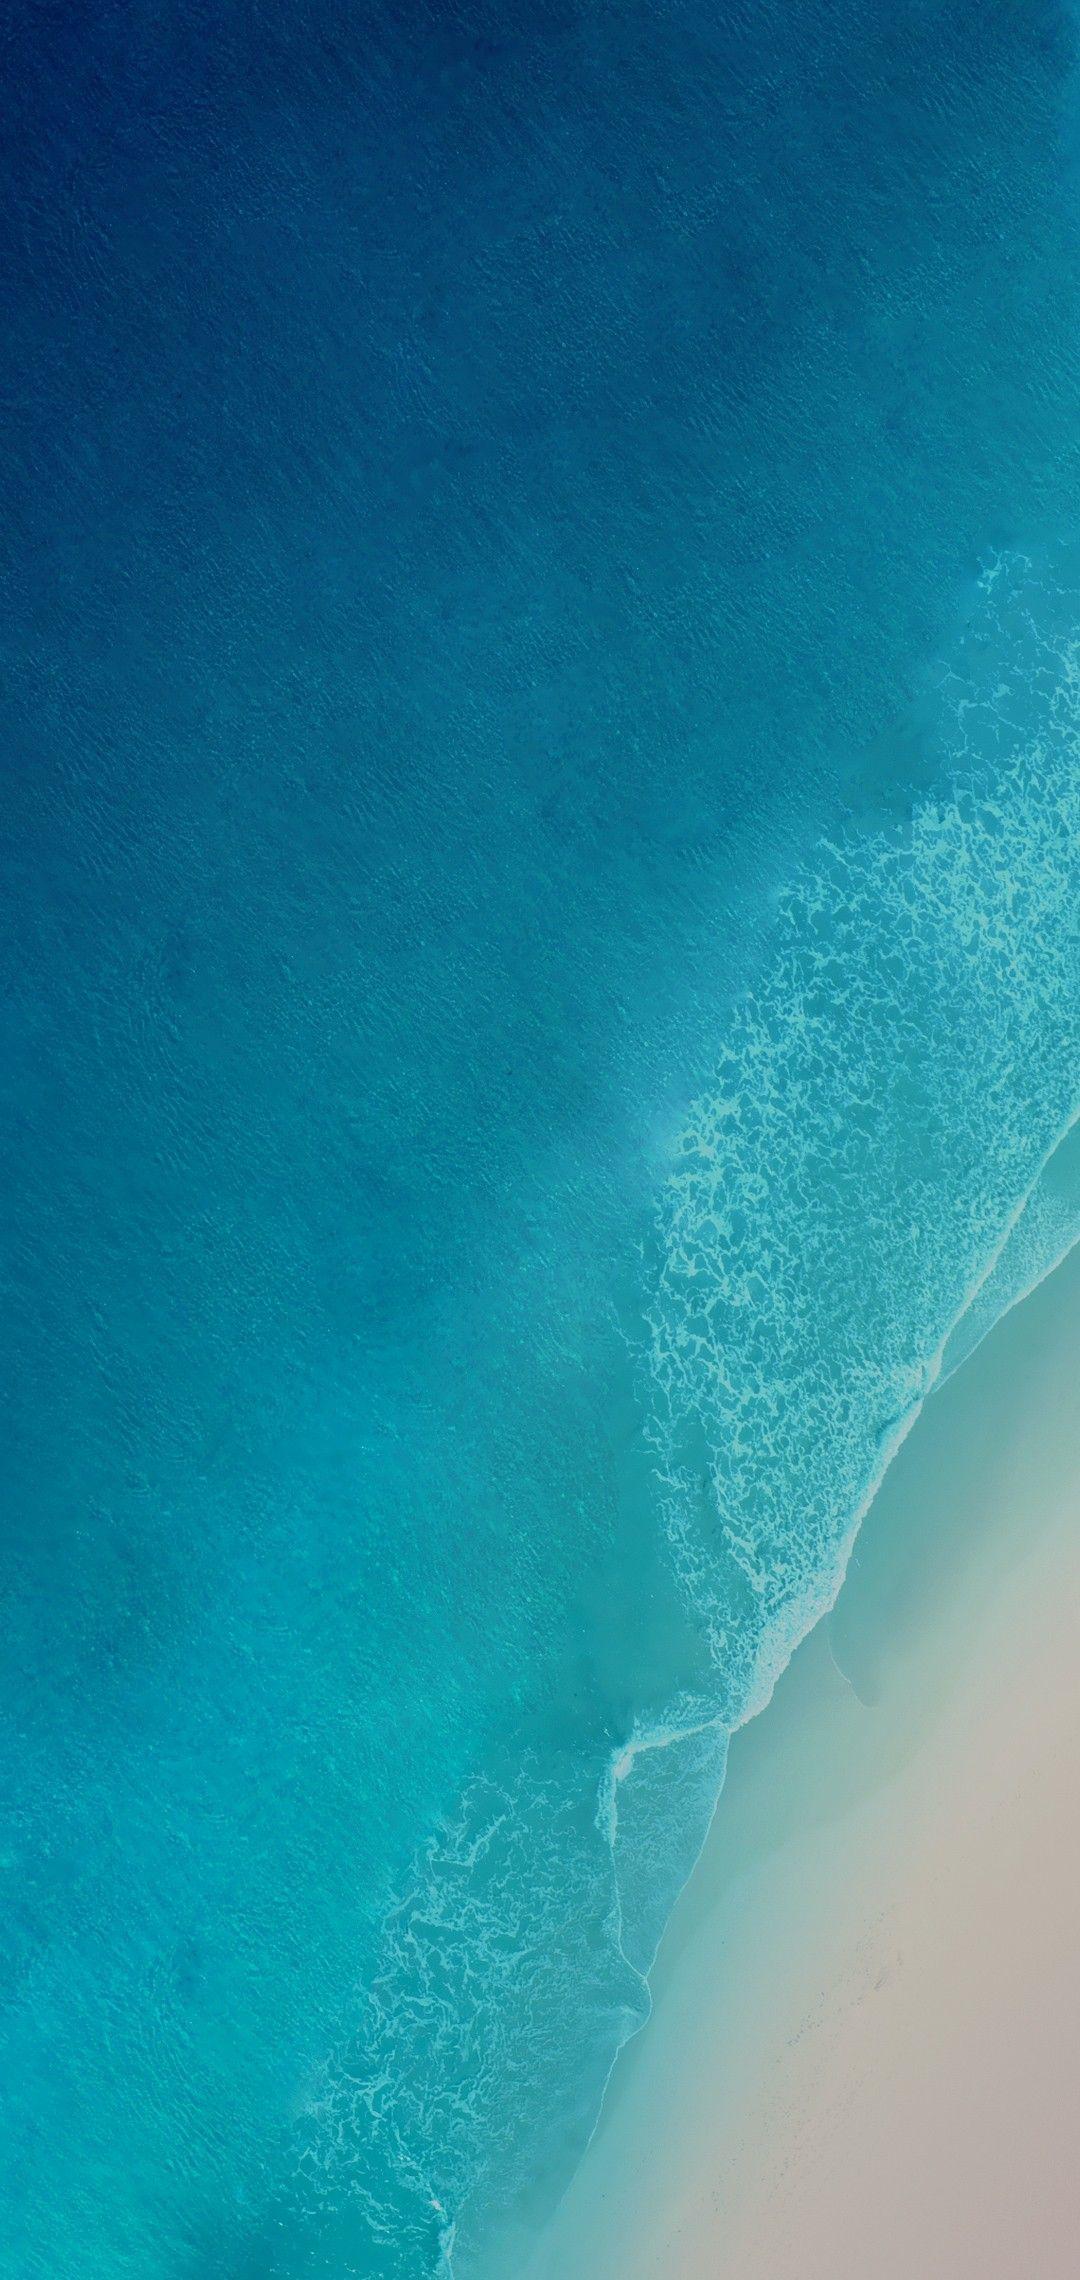 Ios 12 Iphone X Aqua Blue Water Ocean Apple Wallpaper Iphone 8 Clean Beauty Colour Io Iphone Wallpaper Water Iphone Wallpaper Blue Wallpaper Iphone